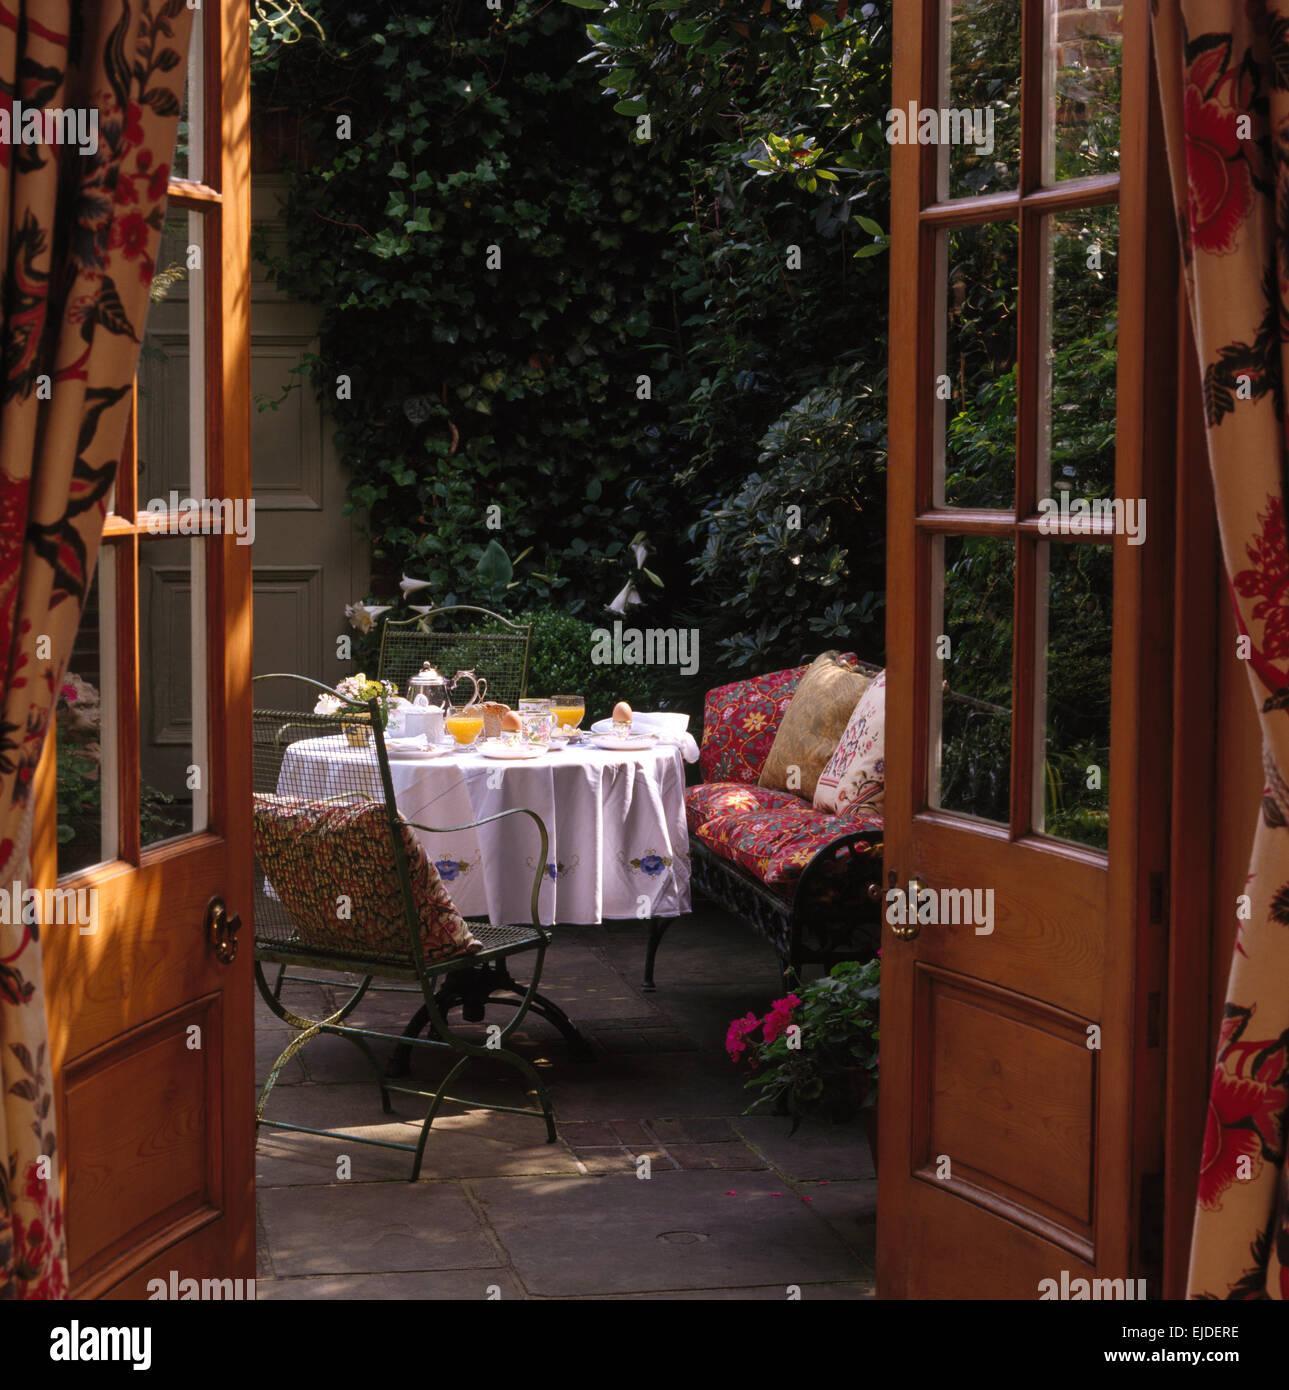 View through french doors of terrace with table set for breakfast view through french doors of terrace with table set for breakfast in small town garden rubansaba